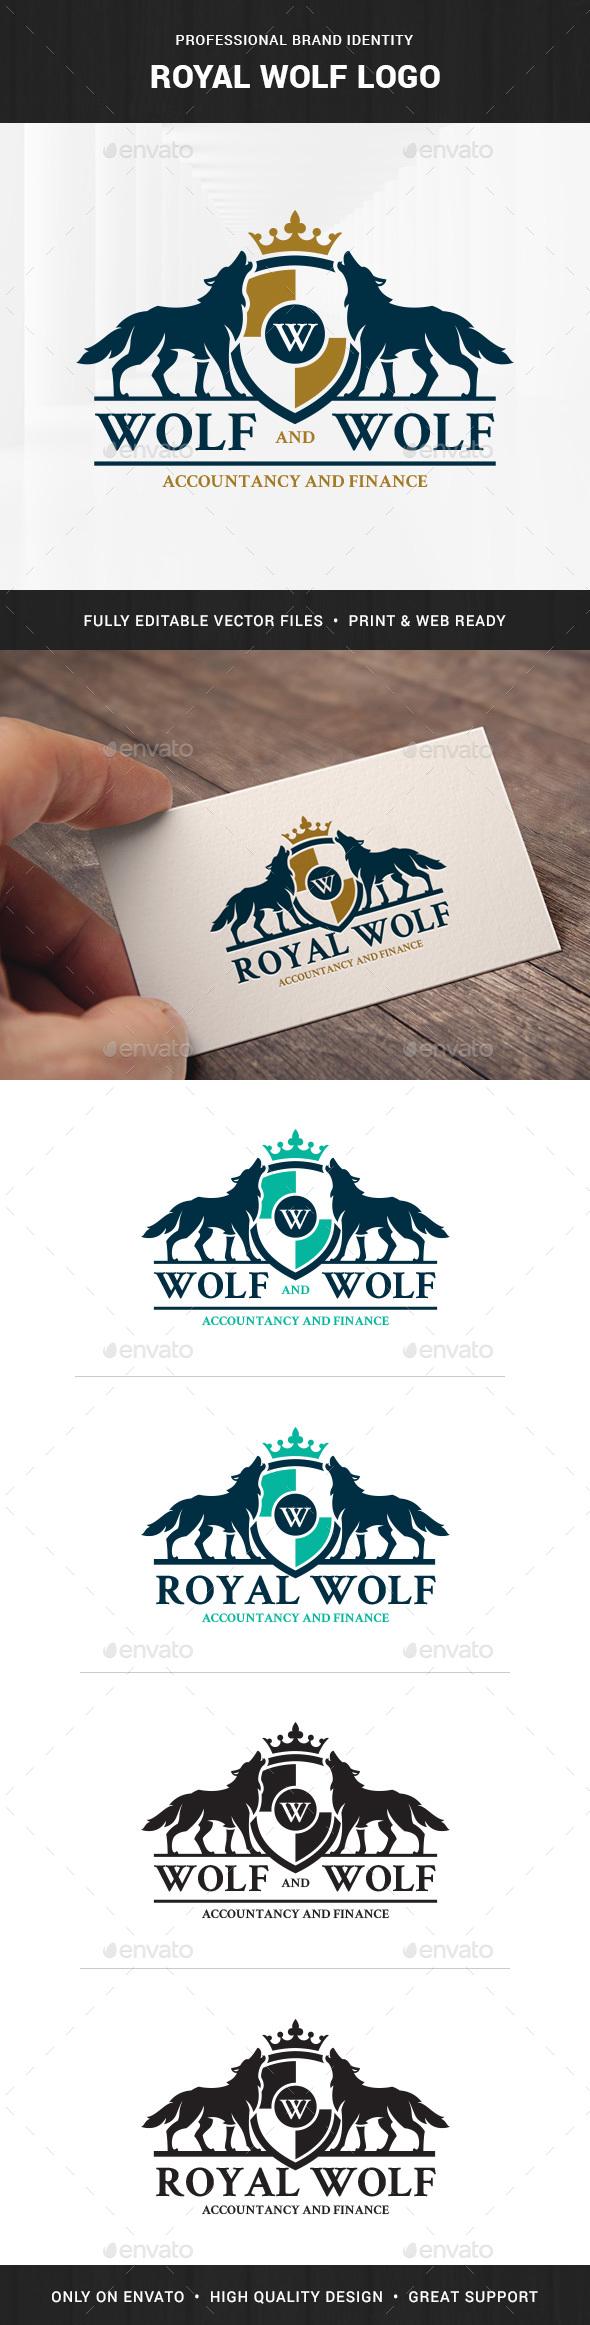 Royal Wolf Logo Template